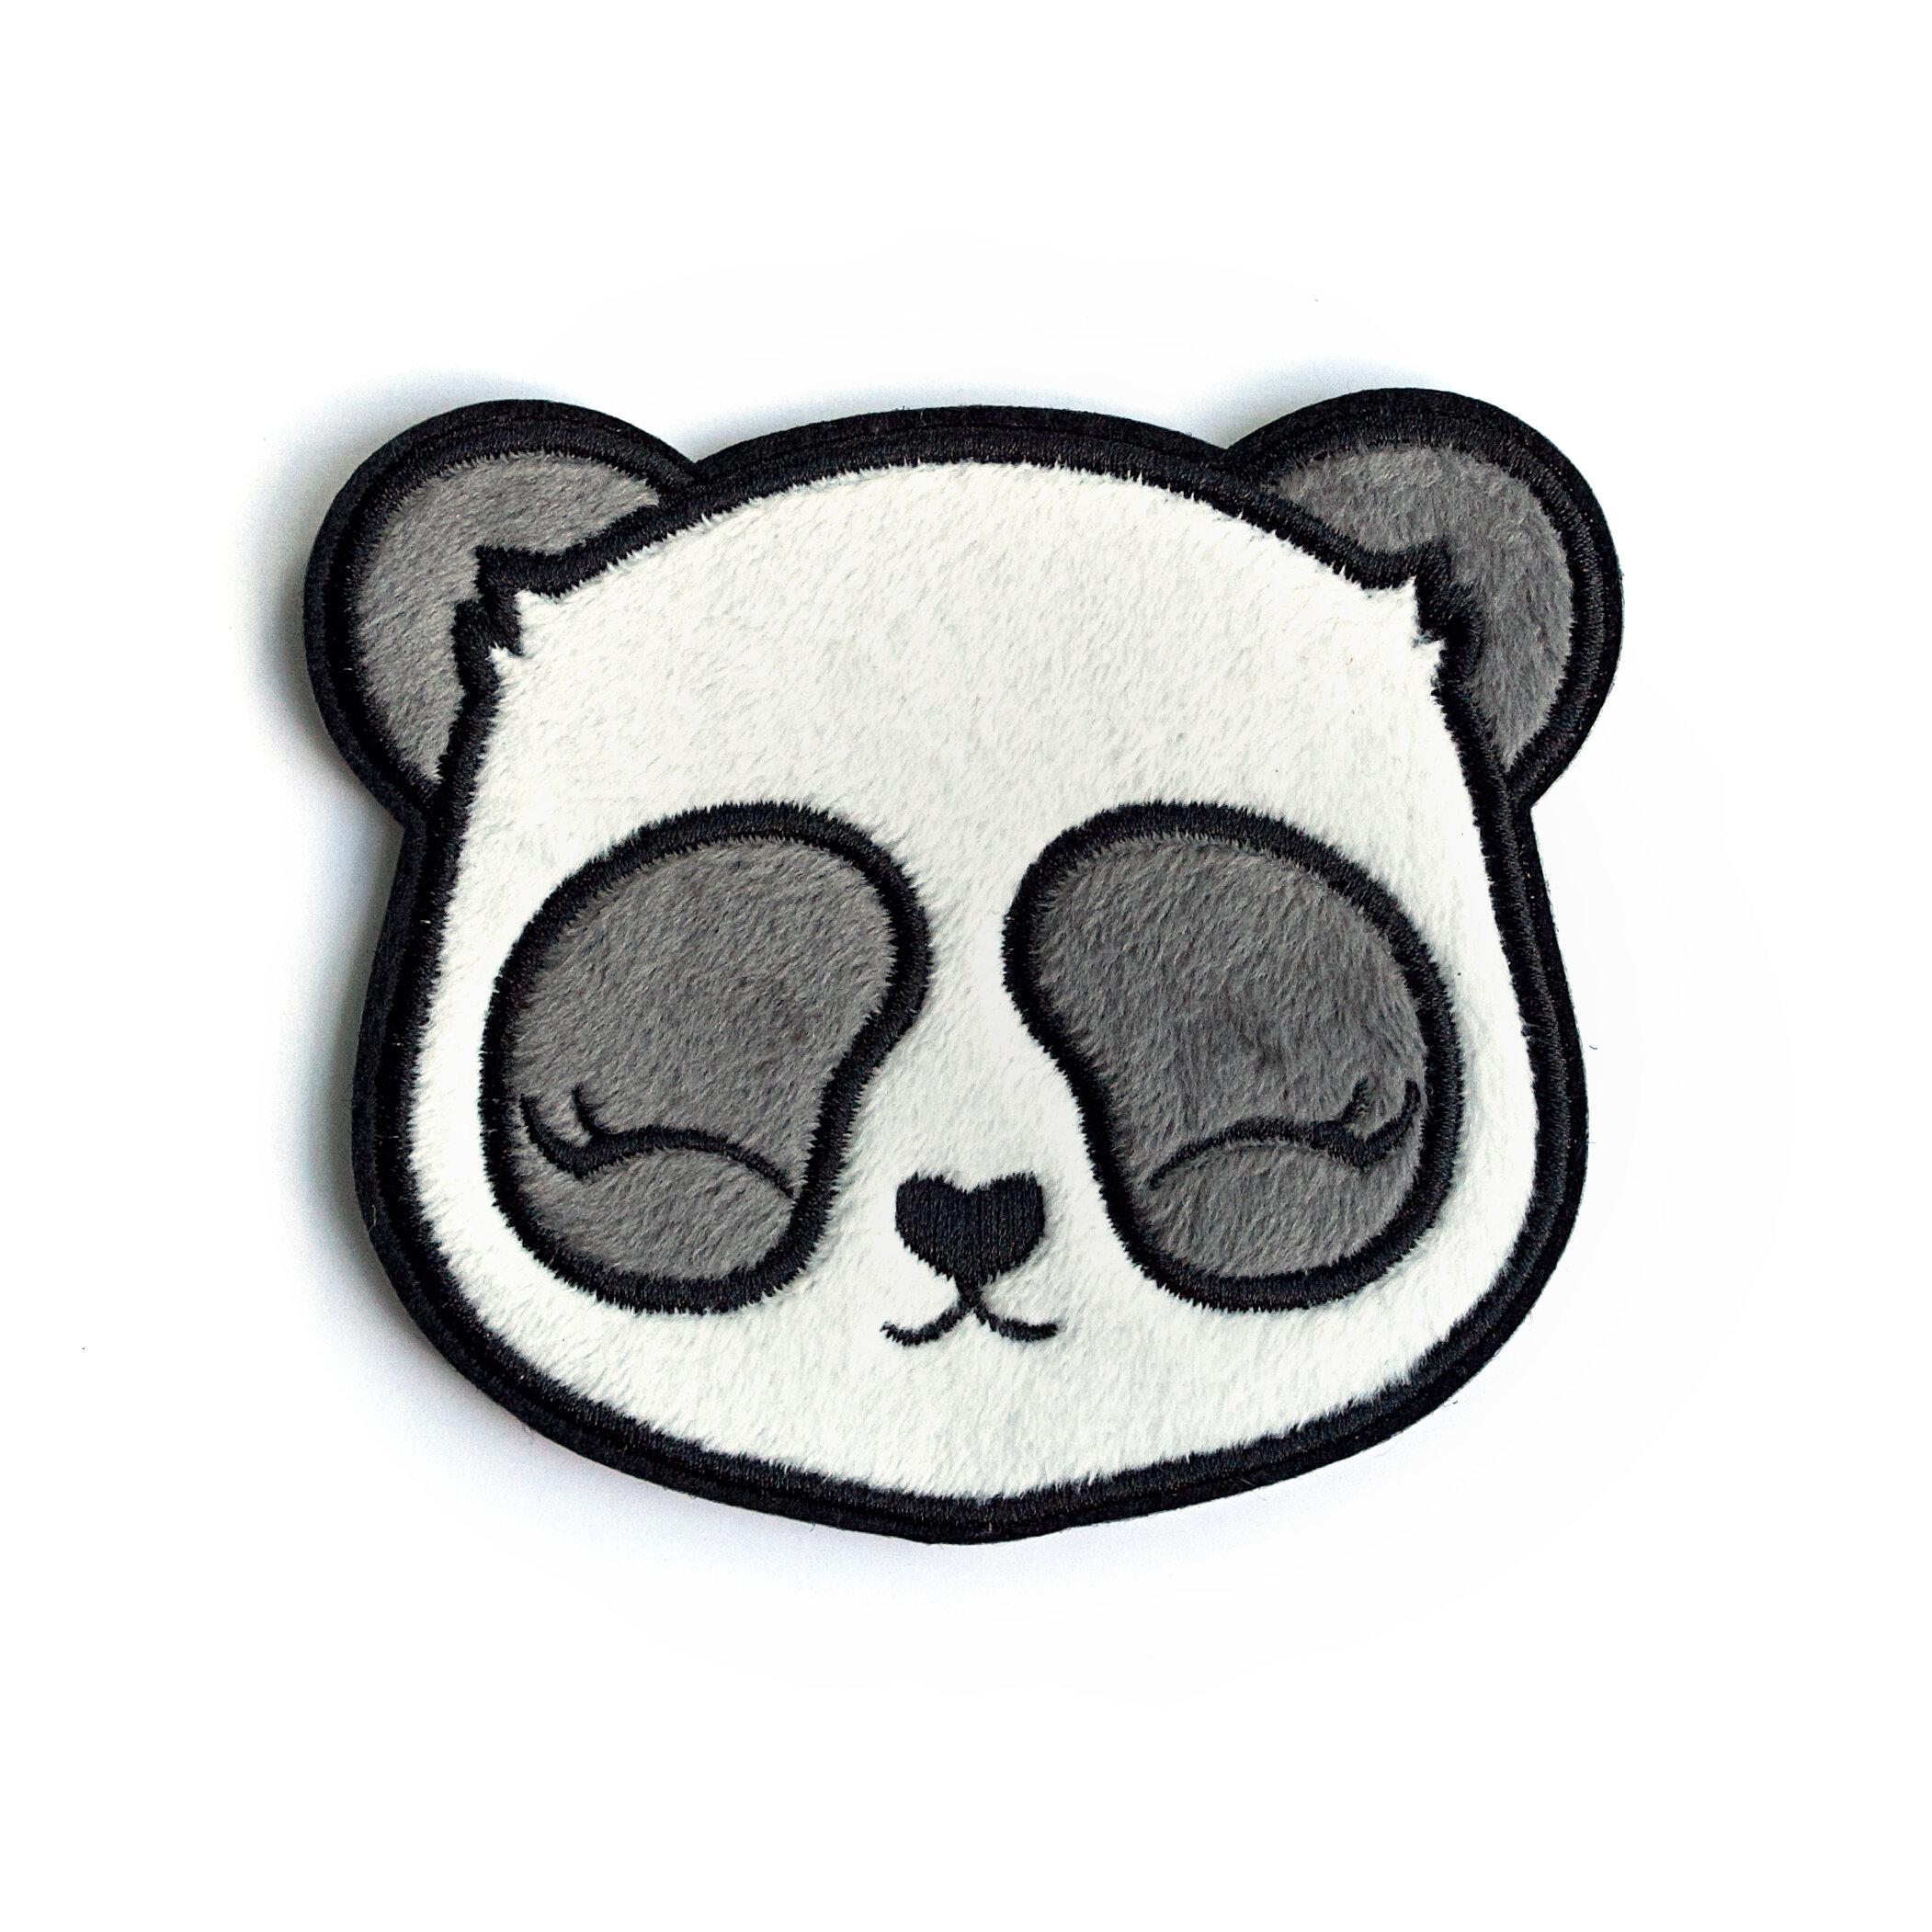 A2 - Panda Patch